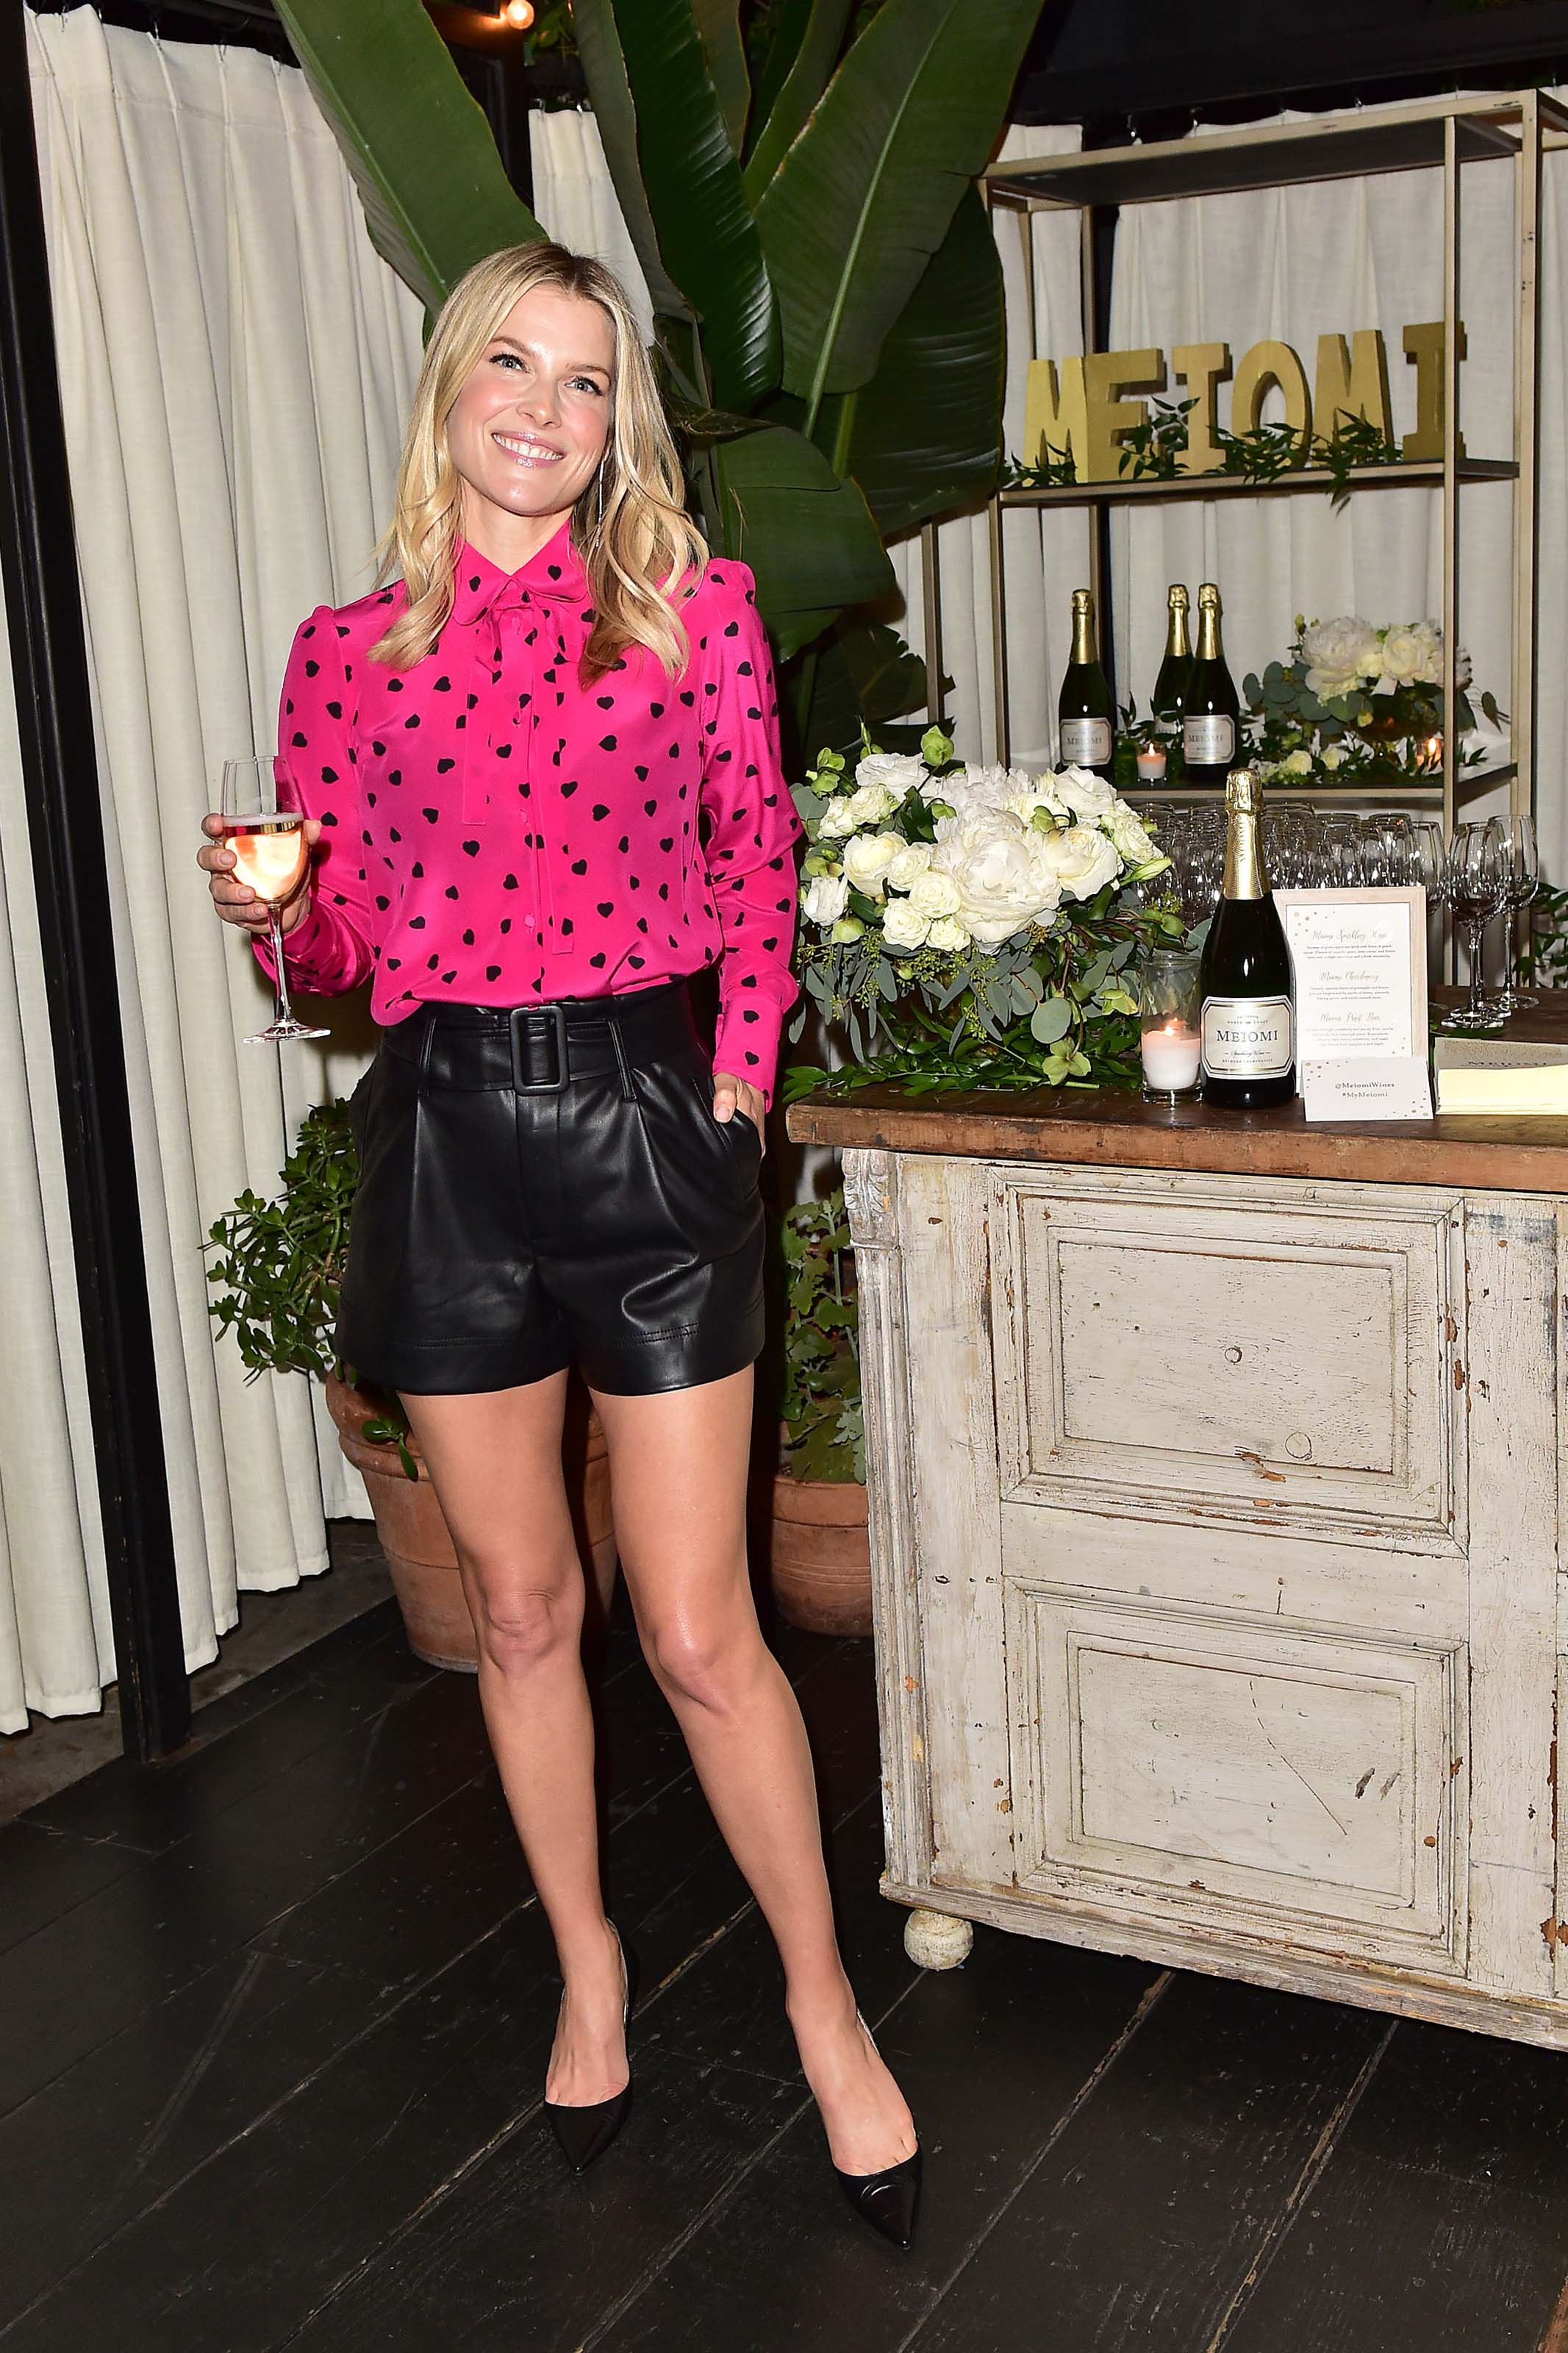 Ali Larter attends Meiomi Sparkling Wine Launch Event